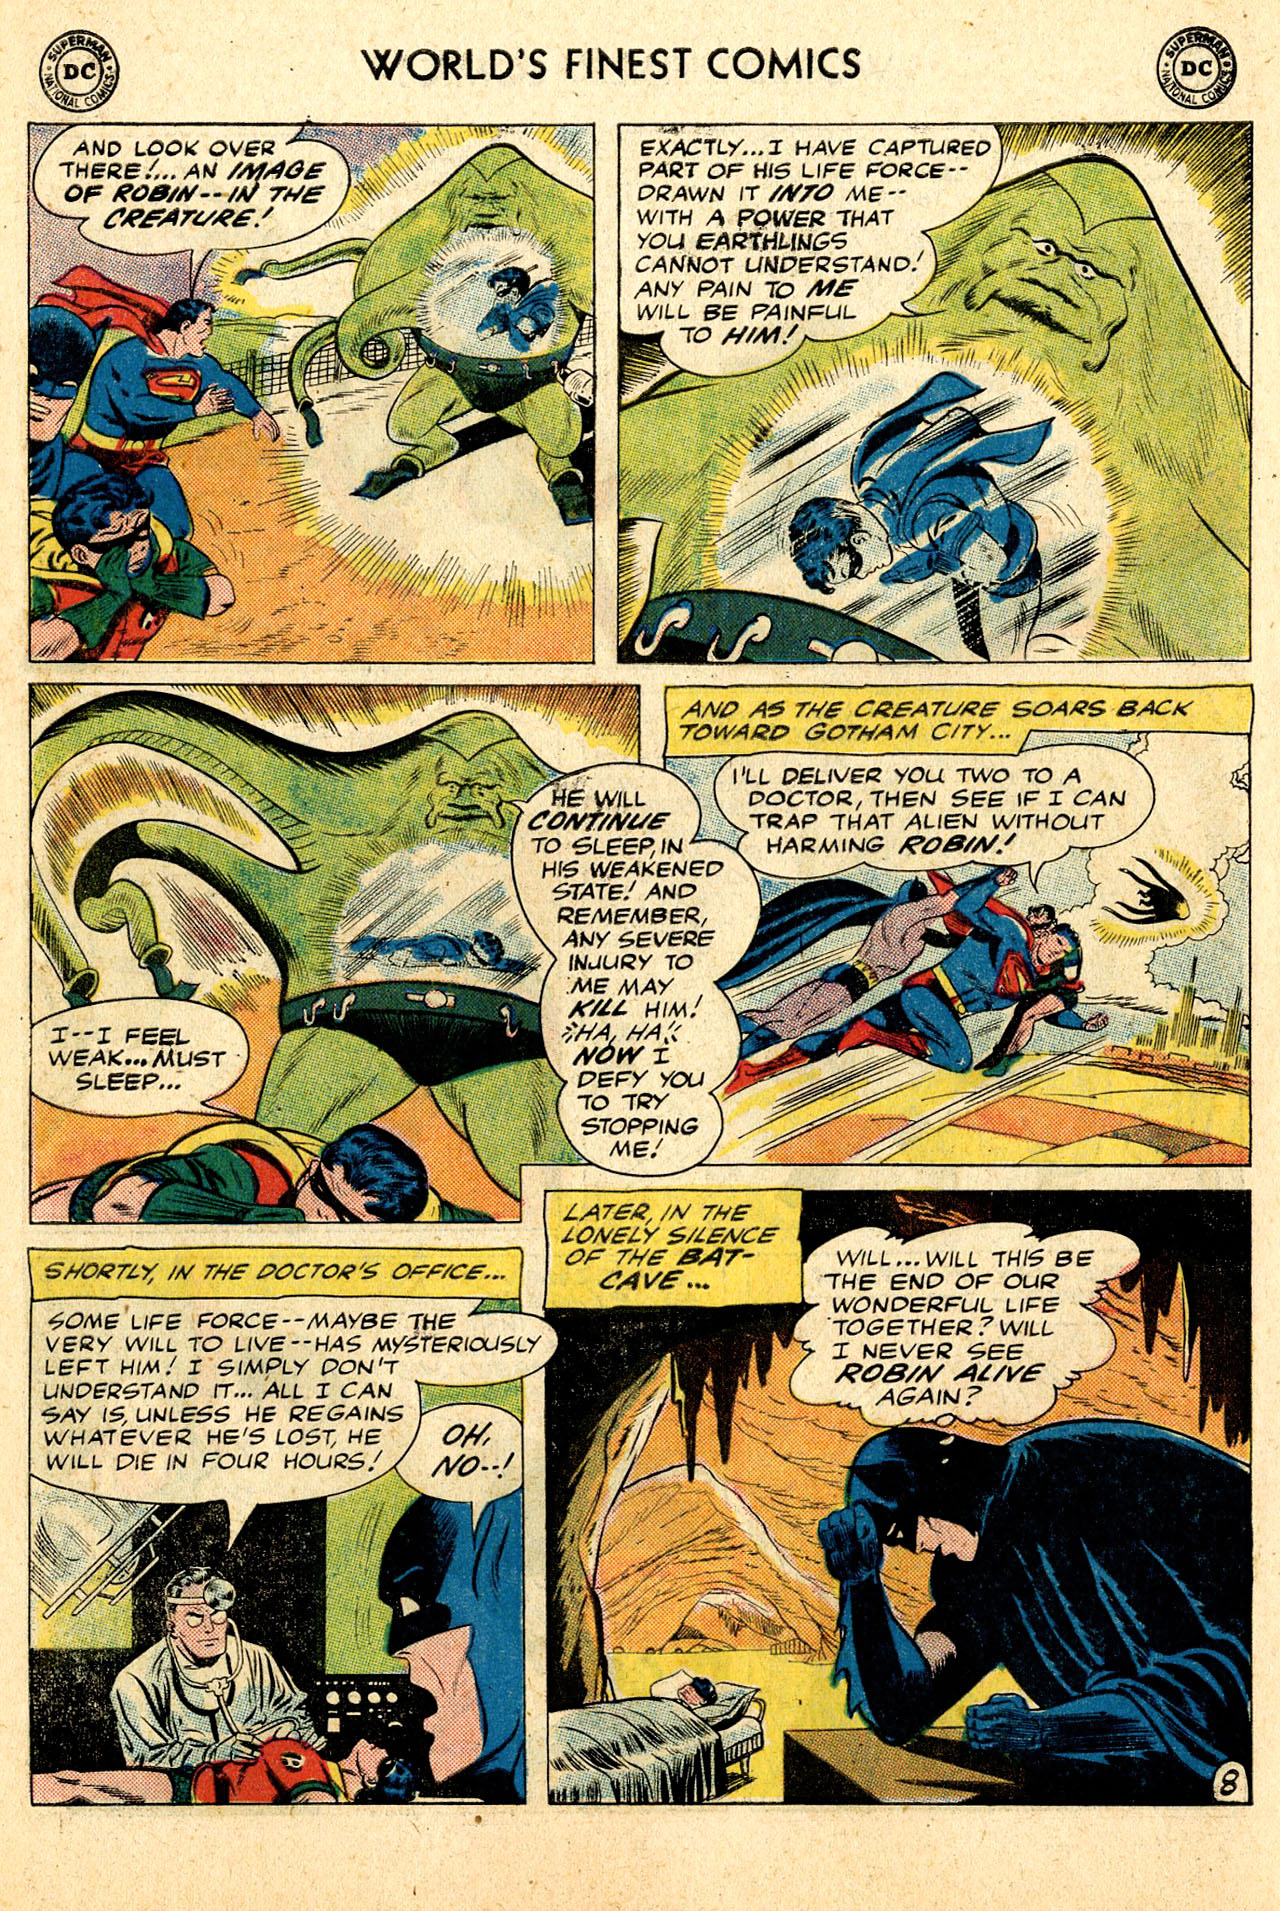 Read online World's Finest Comics comic -  Issue #110 - 10